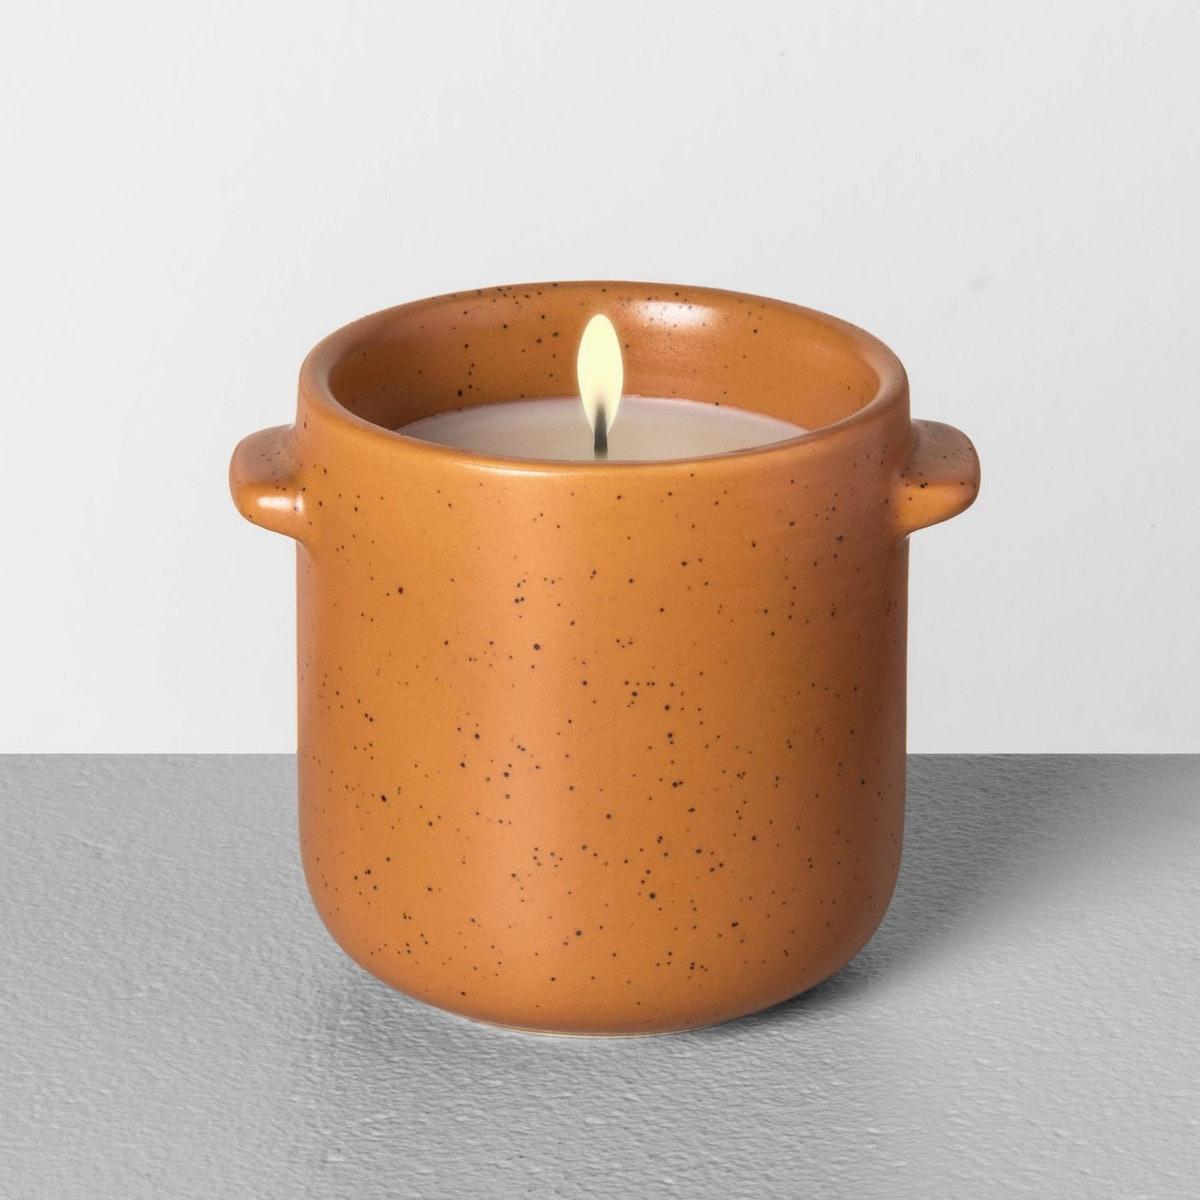 6.2oz Seasonal Ceramic Candle Harvest